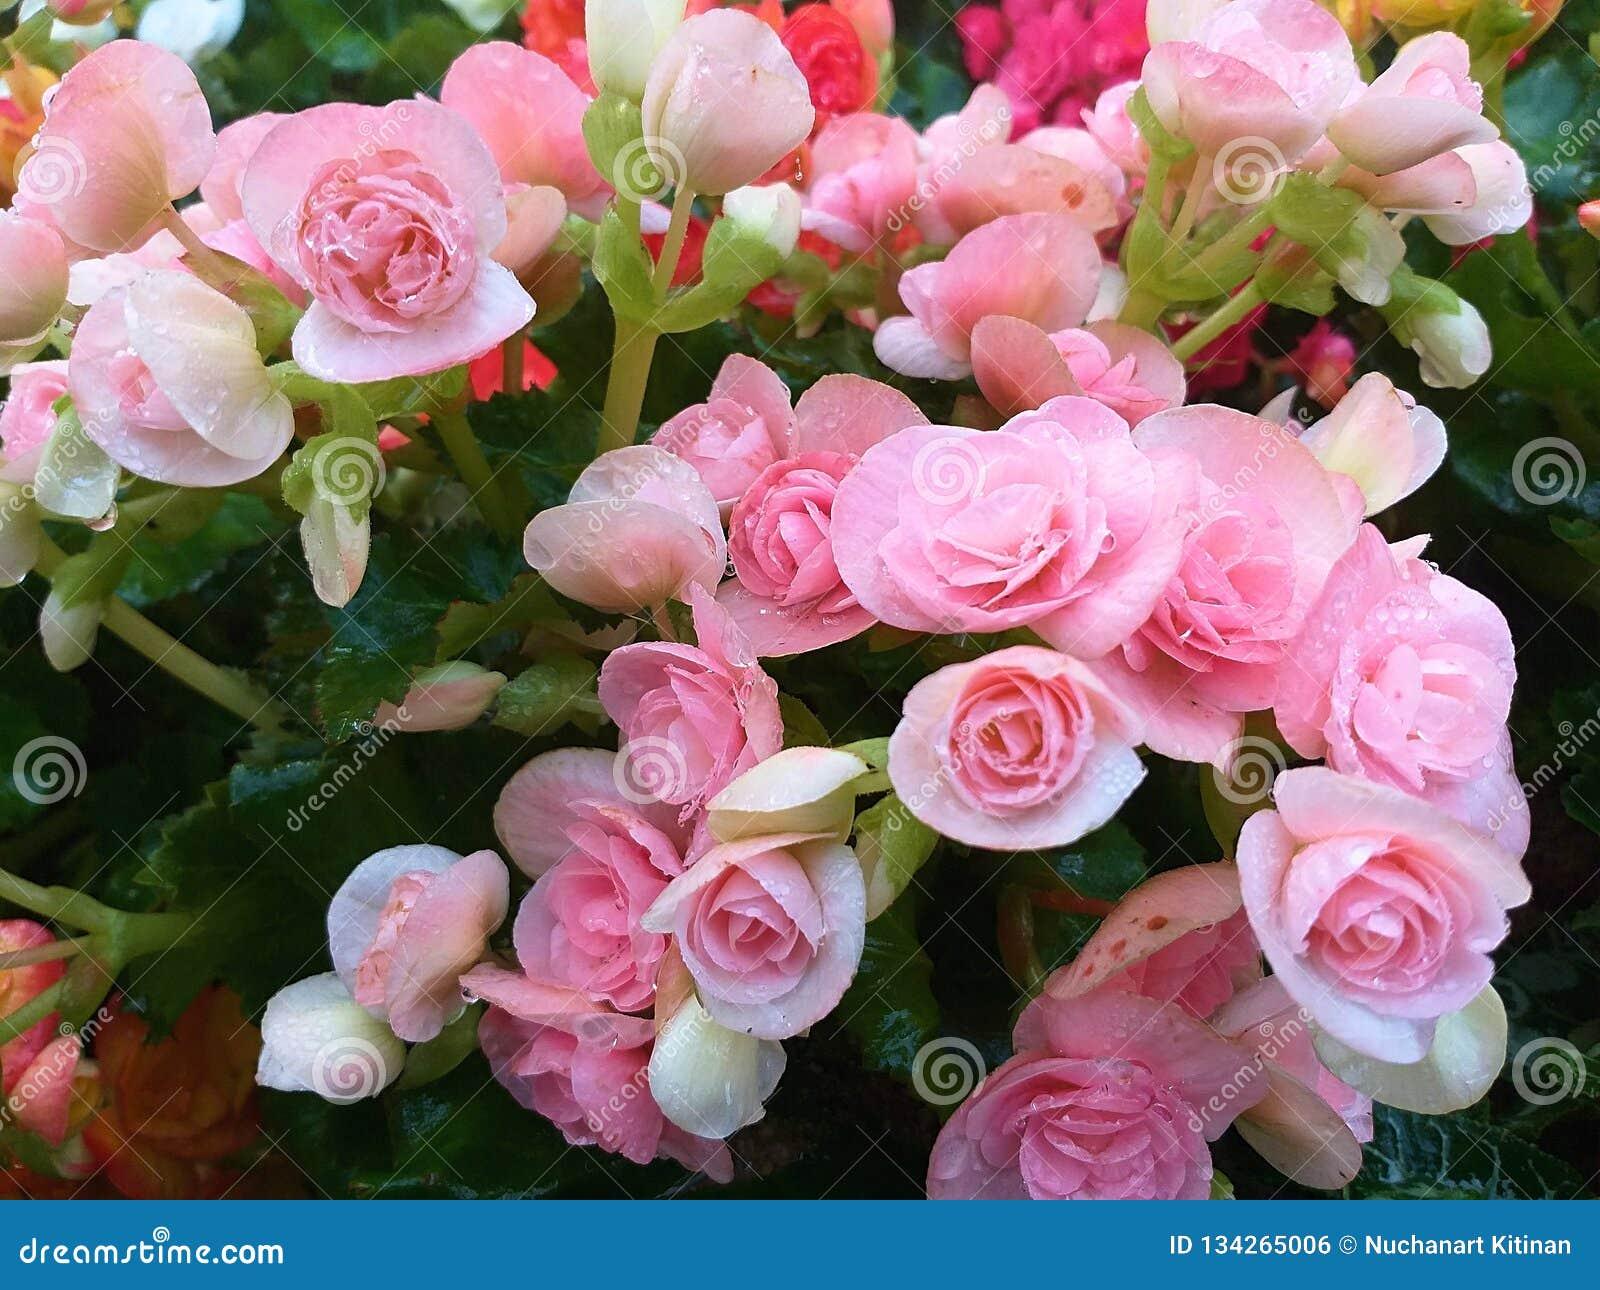 Begonia Begoniaceae Heart Shaped Flower Stock Photo Image Of